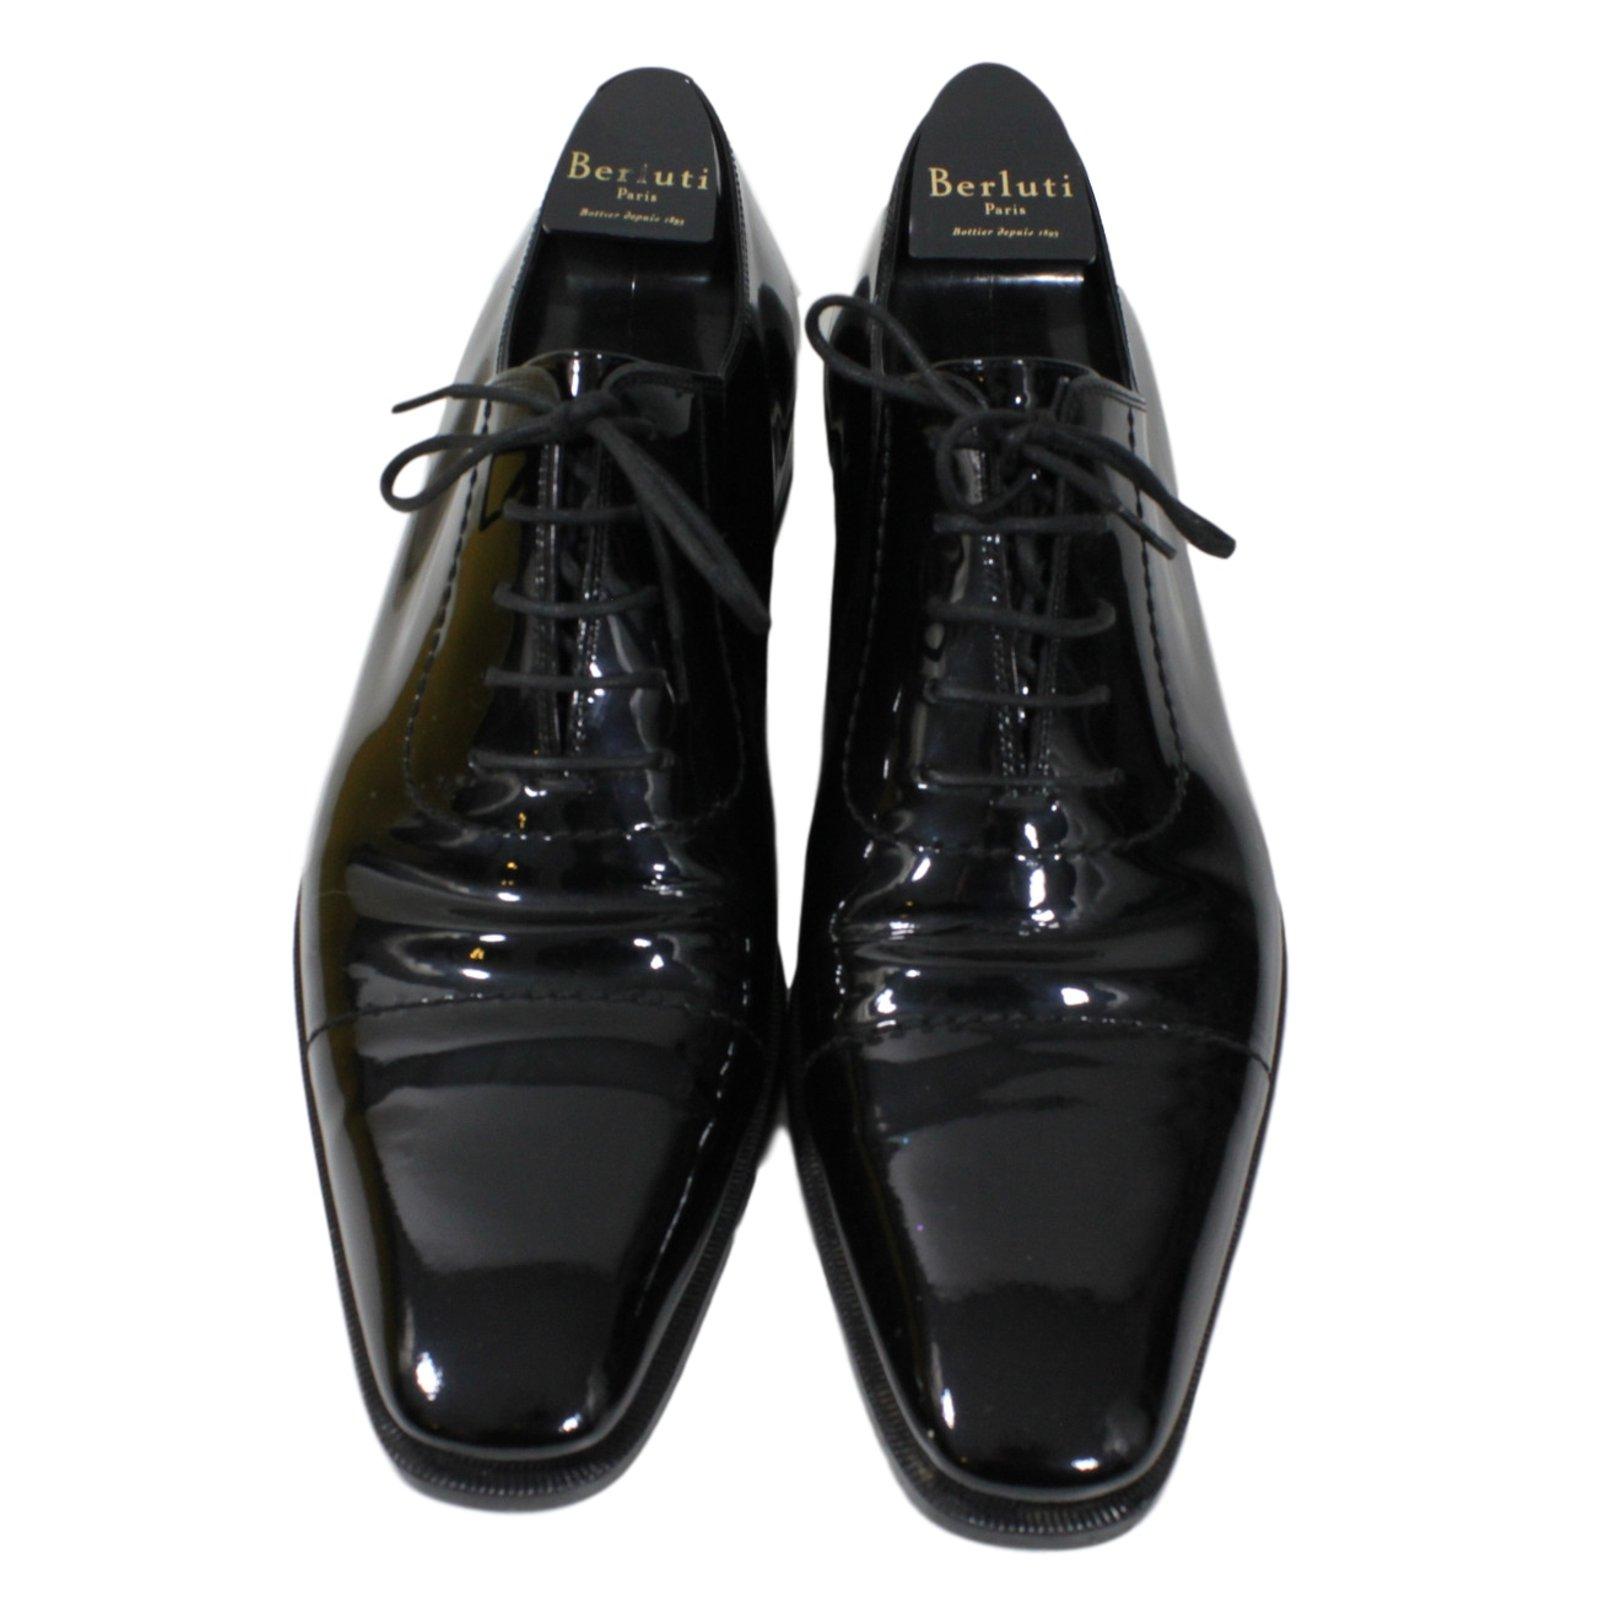 Derbies homme Gucci chaussures Gucci Homme Cuir vernis Noir ref.15748 6604454537c